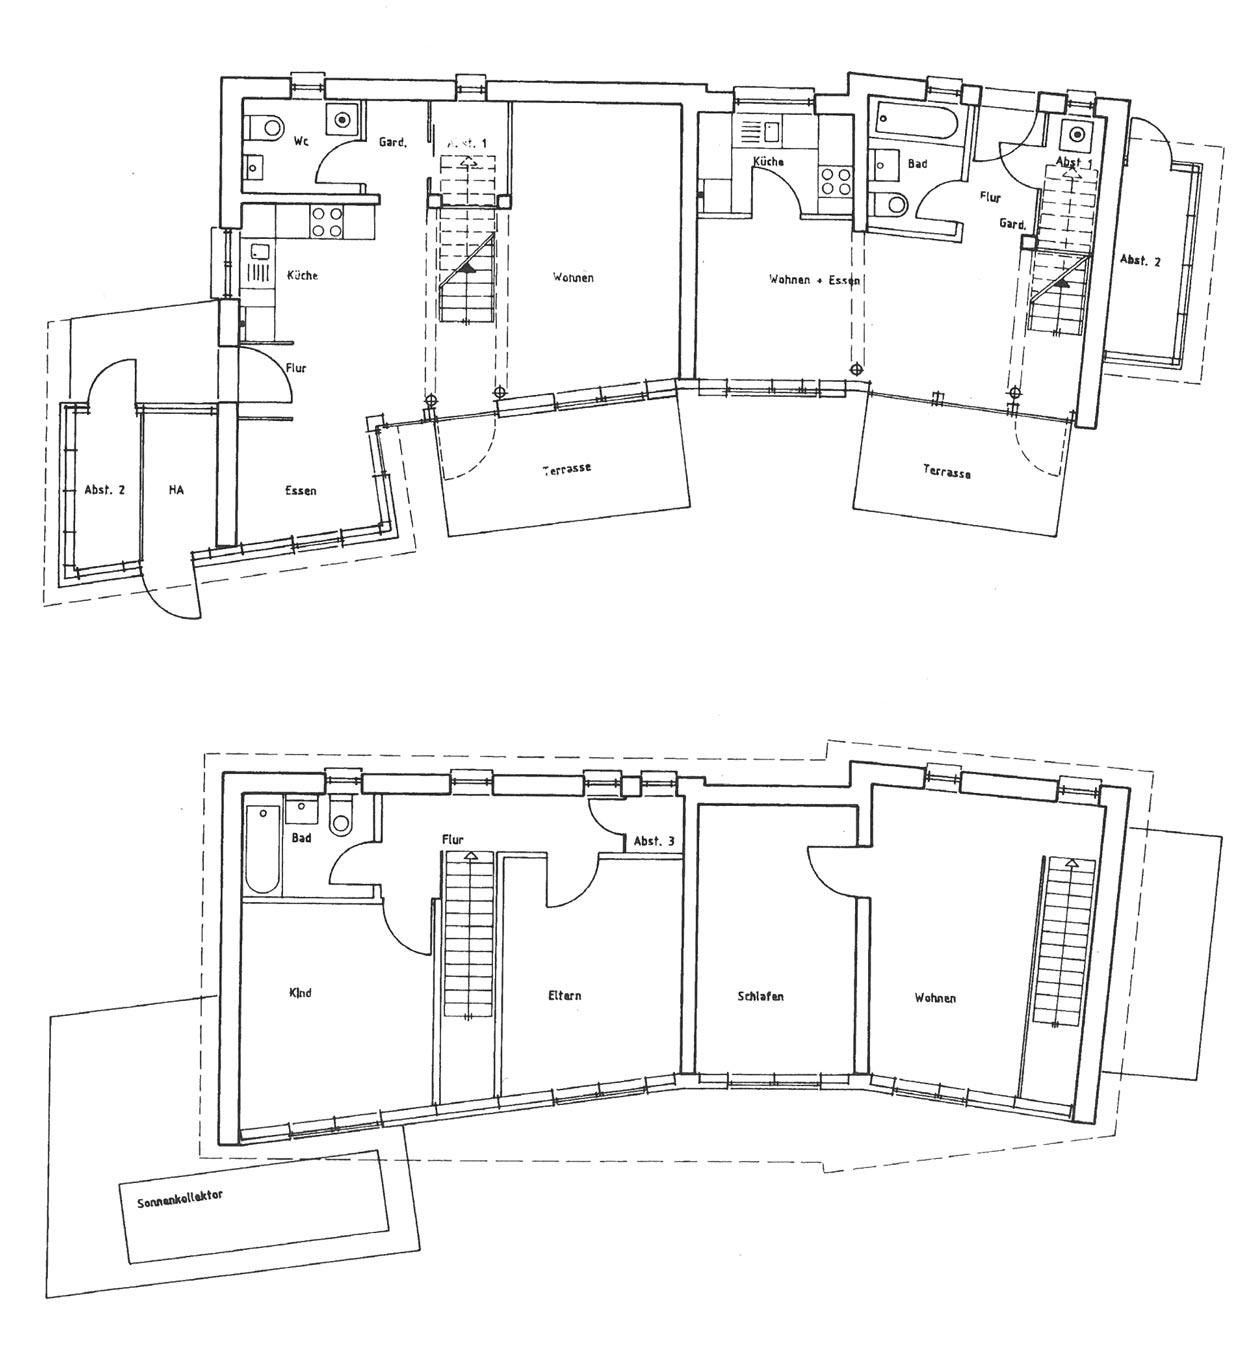 Grundrisse Siedlung Fürst Hardenberg Dortmund-Lindenhorst Planquadrat Dortmund